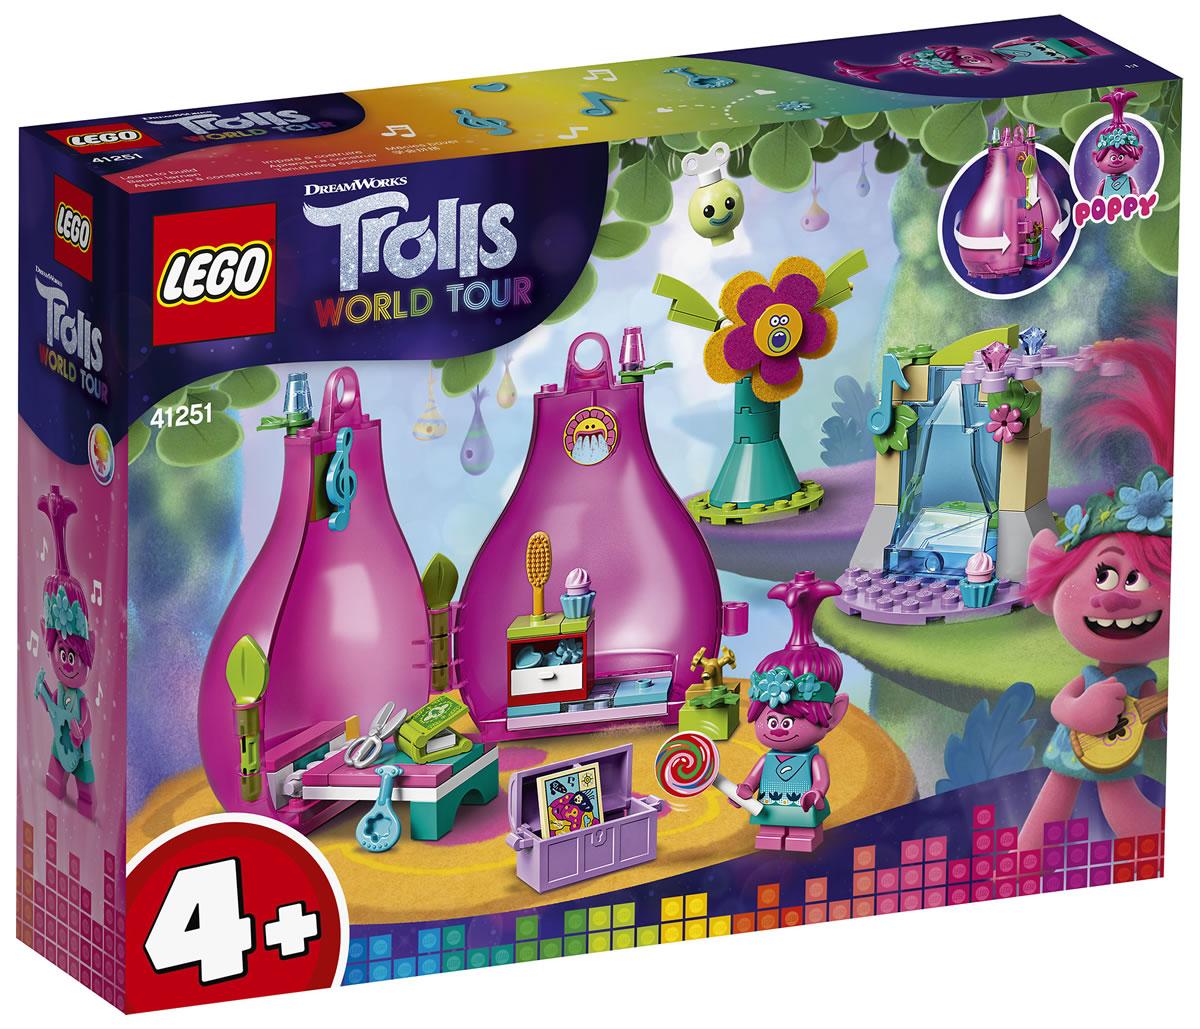 41251-lego-trolls-poppy-rod-box-2020-box zusammengebaut.com